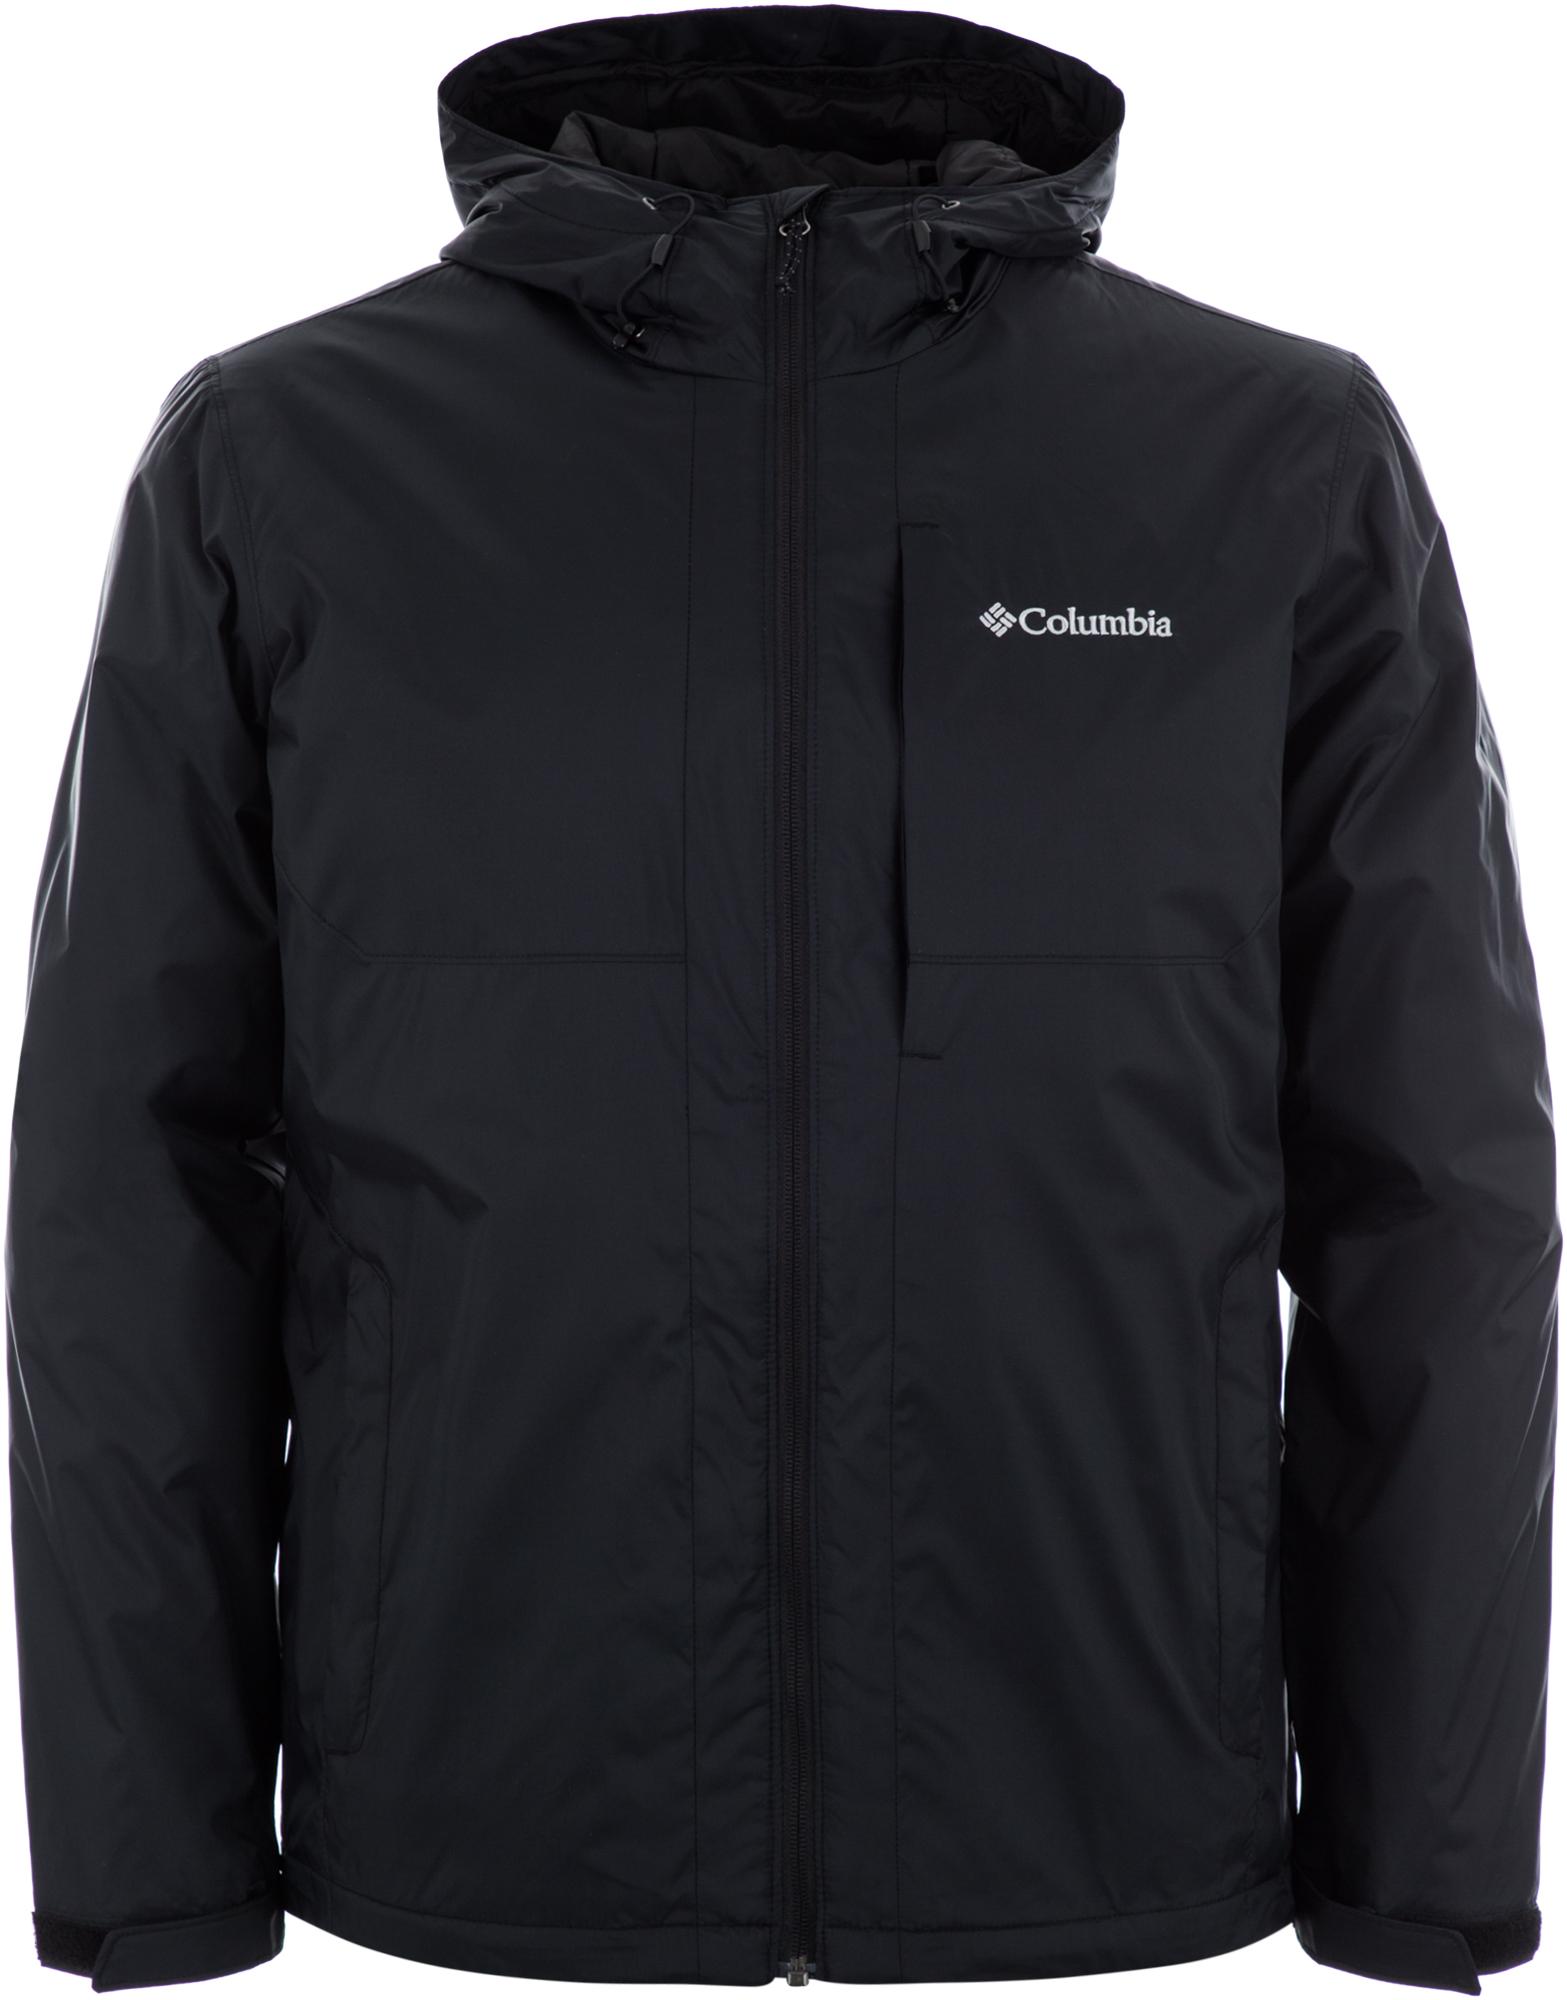 Columbia Куртка утепленная мужская Columbia Straight Line™, размер 46 columbia куртка утепленная мужская columbia eagles call